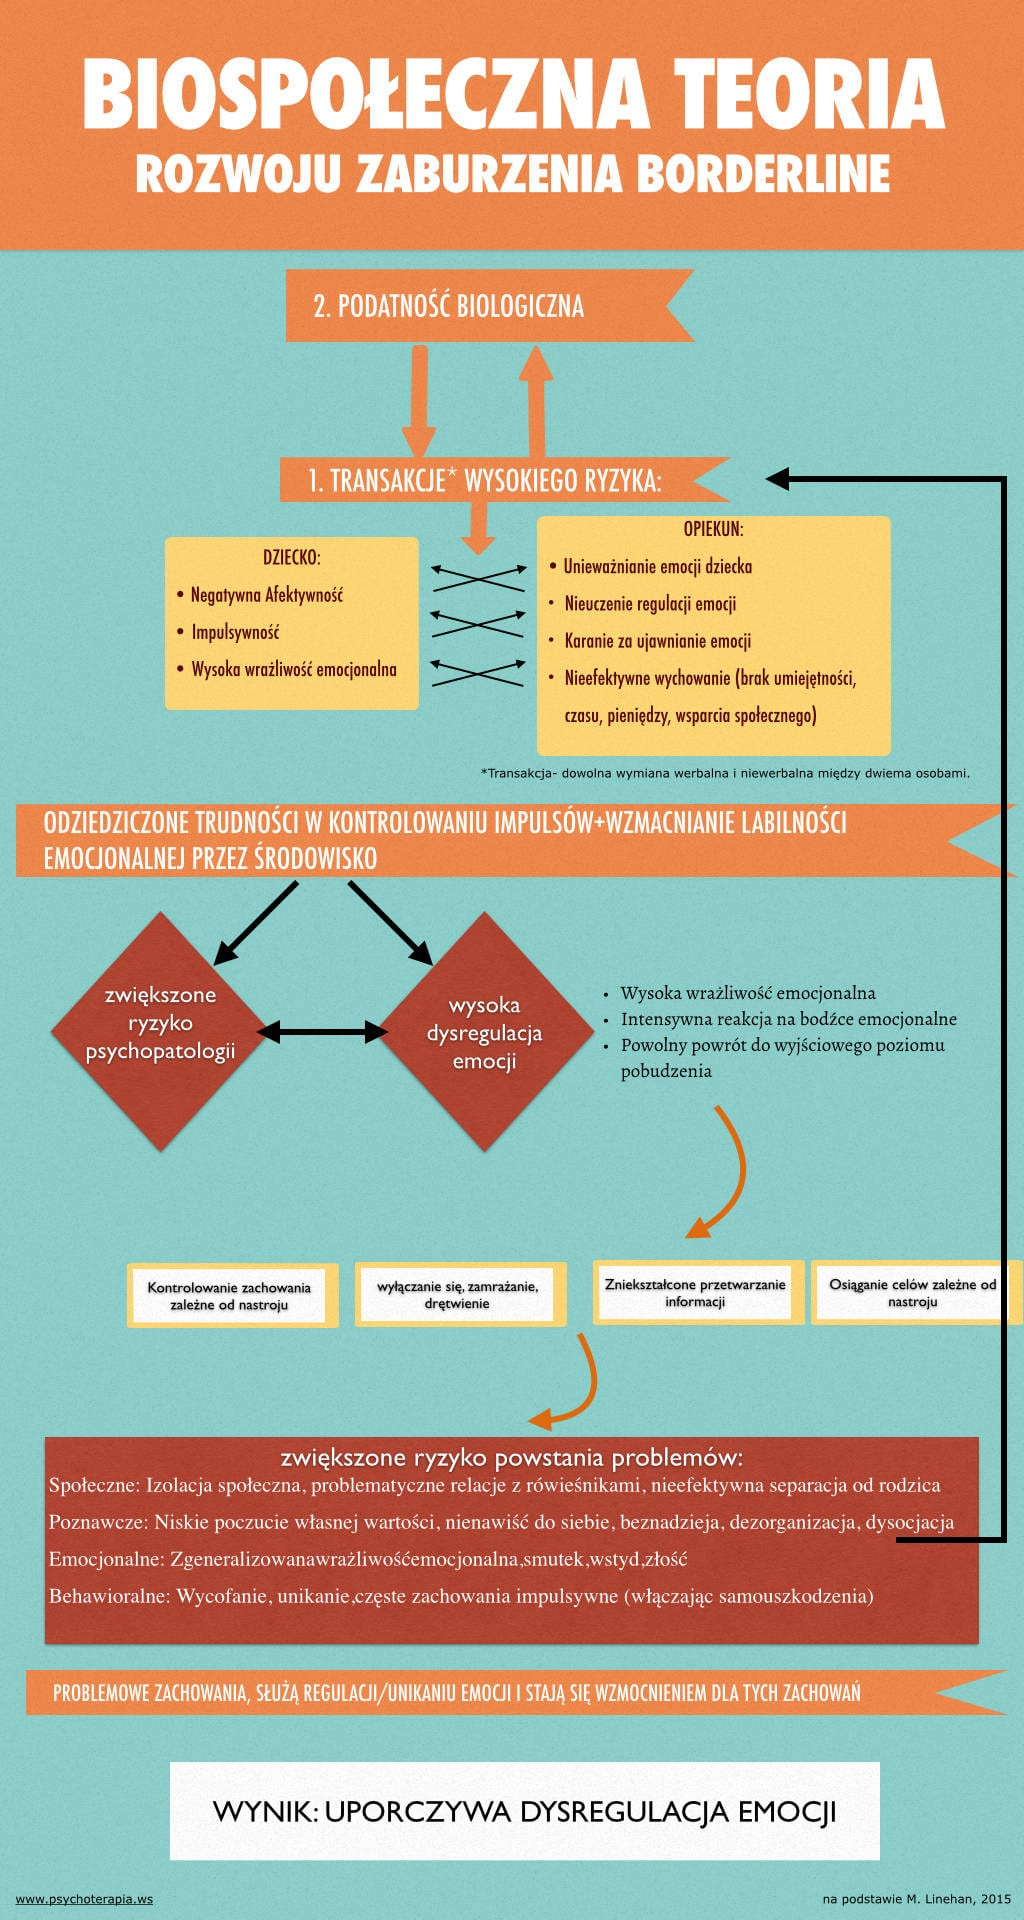 Skąd się bierze borderline: Teoria Biospołeczna Skąd się bierze borderline: Teoria Biospołeczna bpd teoria biospoleczna